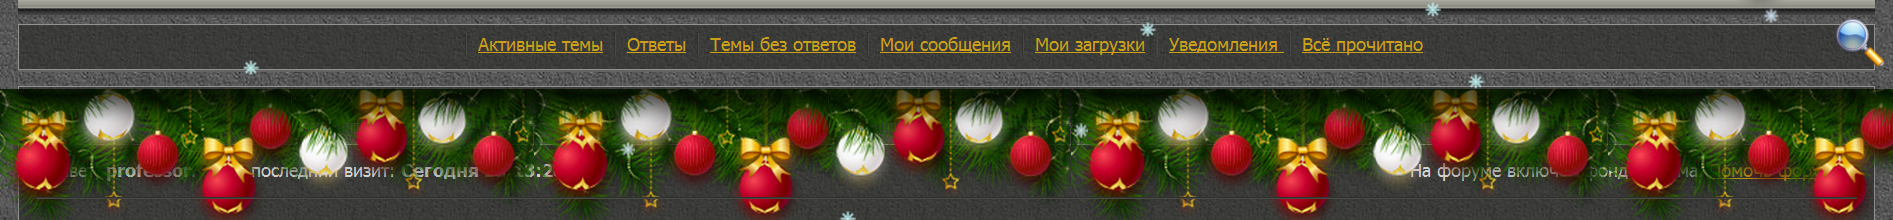 http://s4.uploads.ru/qcA91.png